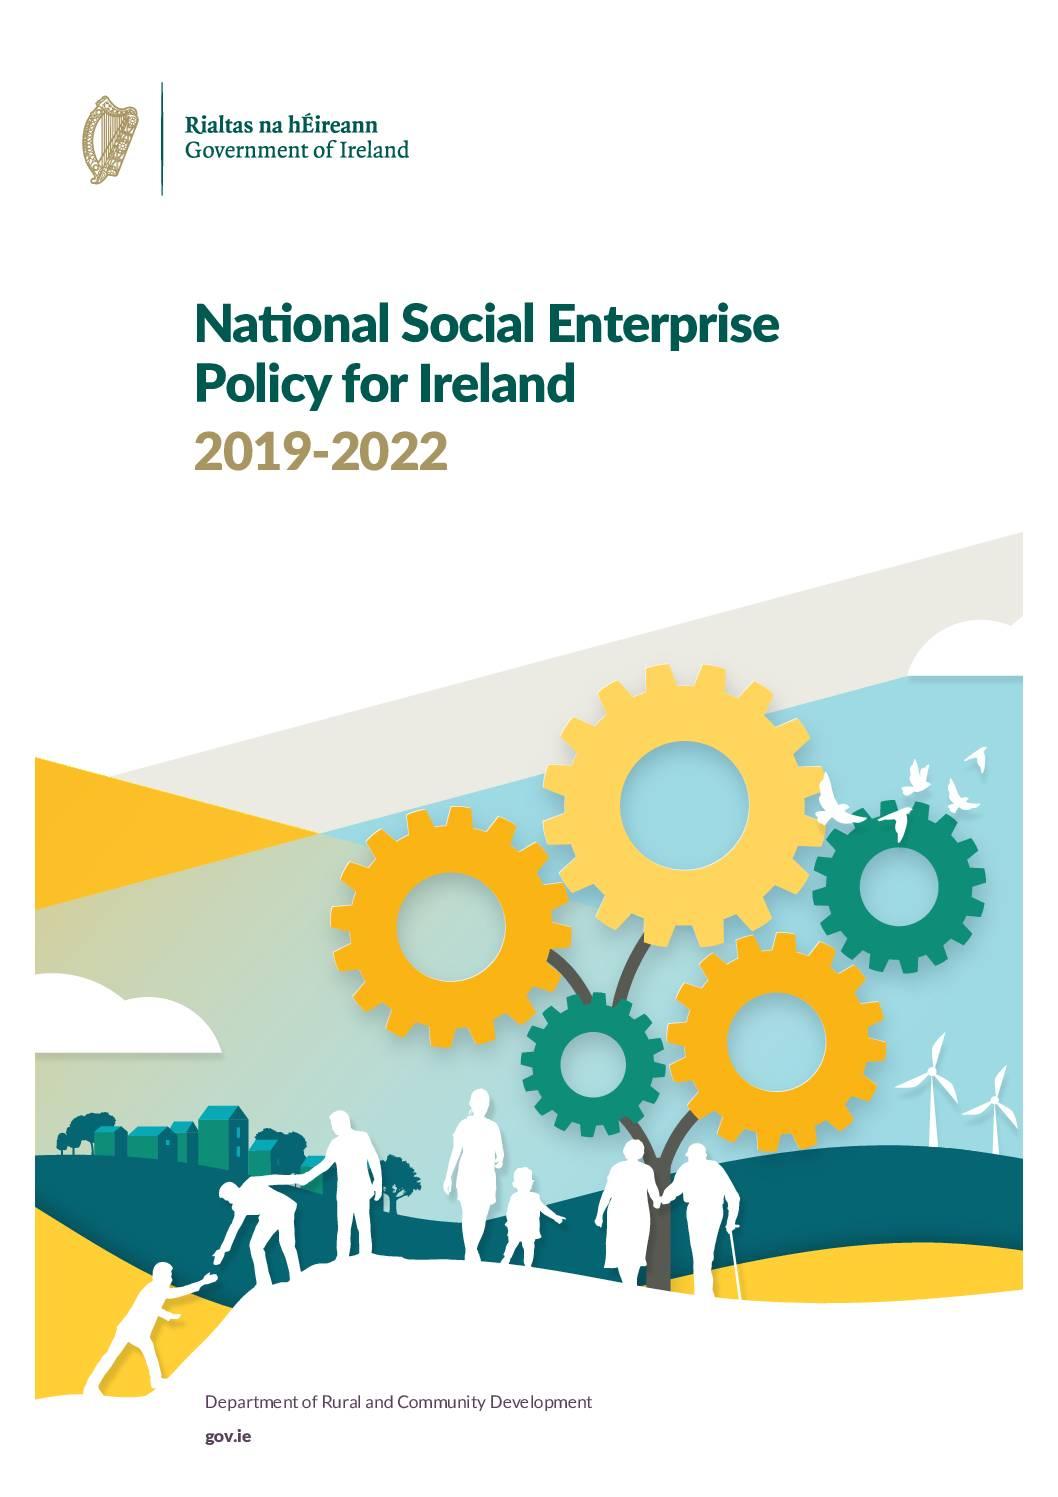 National Social Enterprise Policy for Ireland